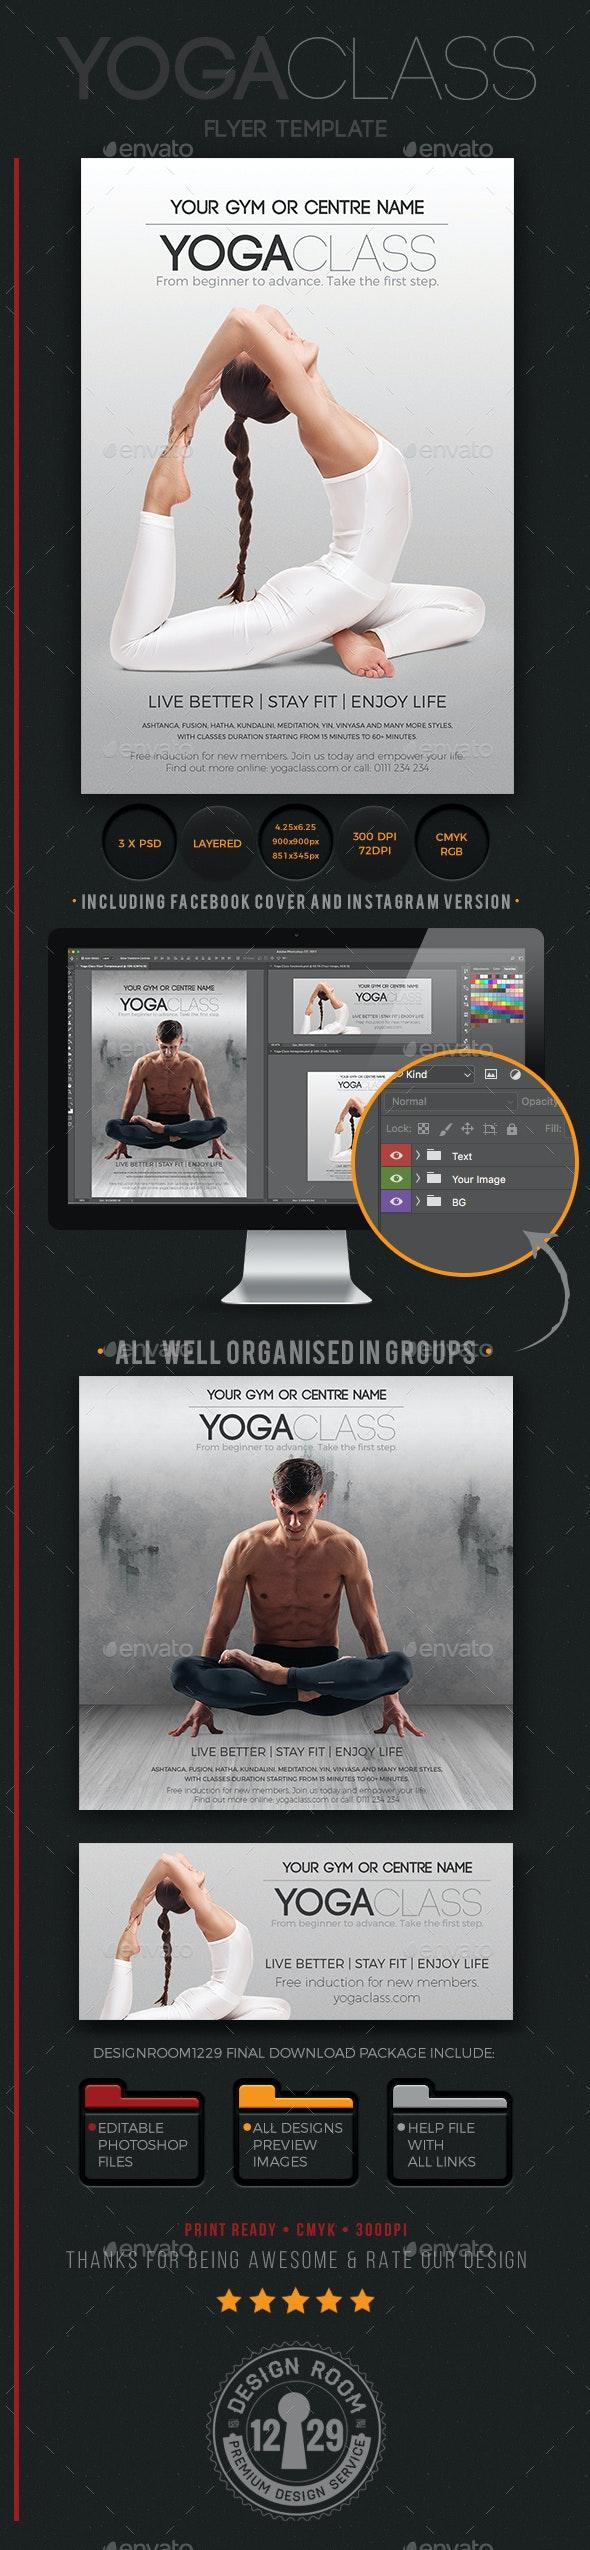 Yoga Class Flyer, Instagram & Facebook Templates - Sports Events